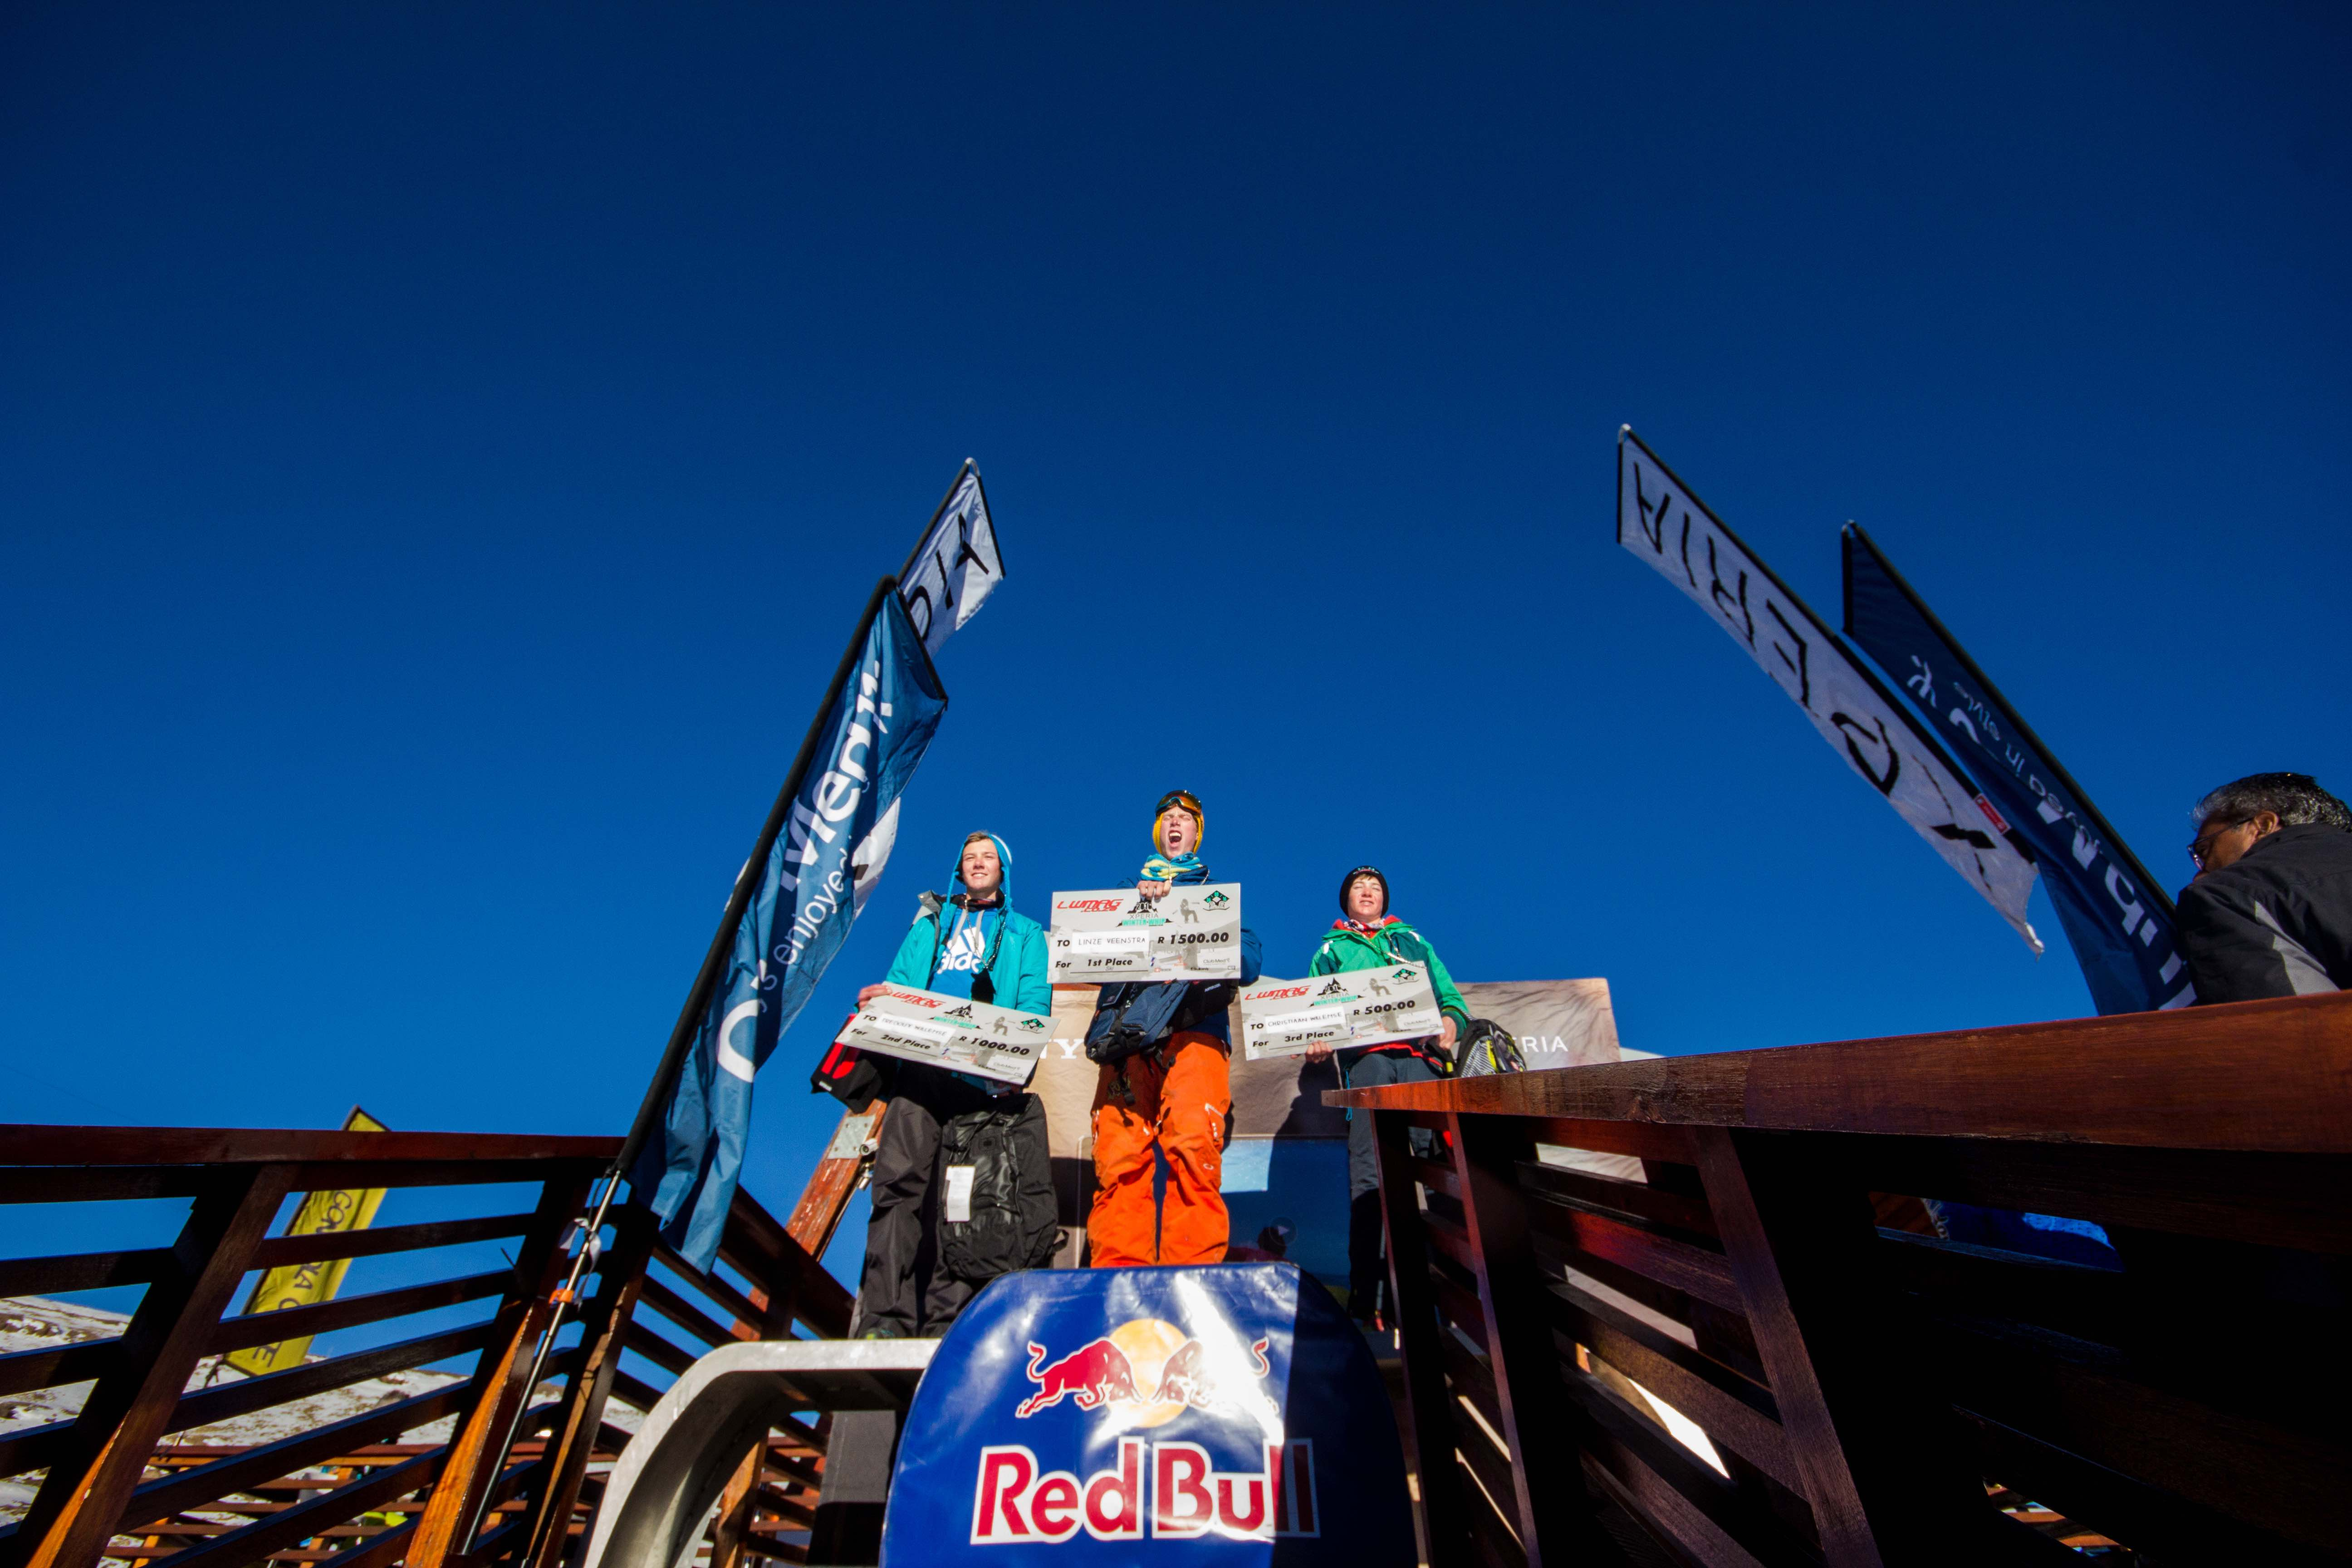 Ski podium at Xperia Winter Whip 2016